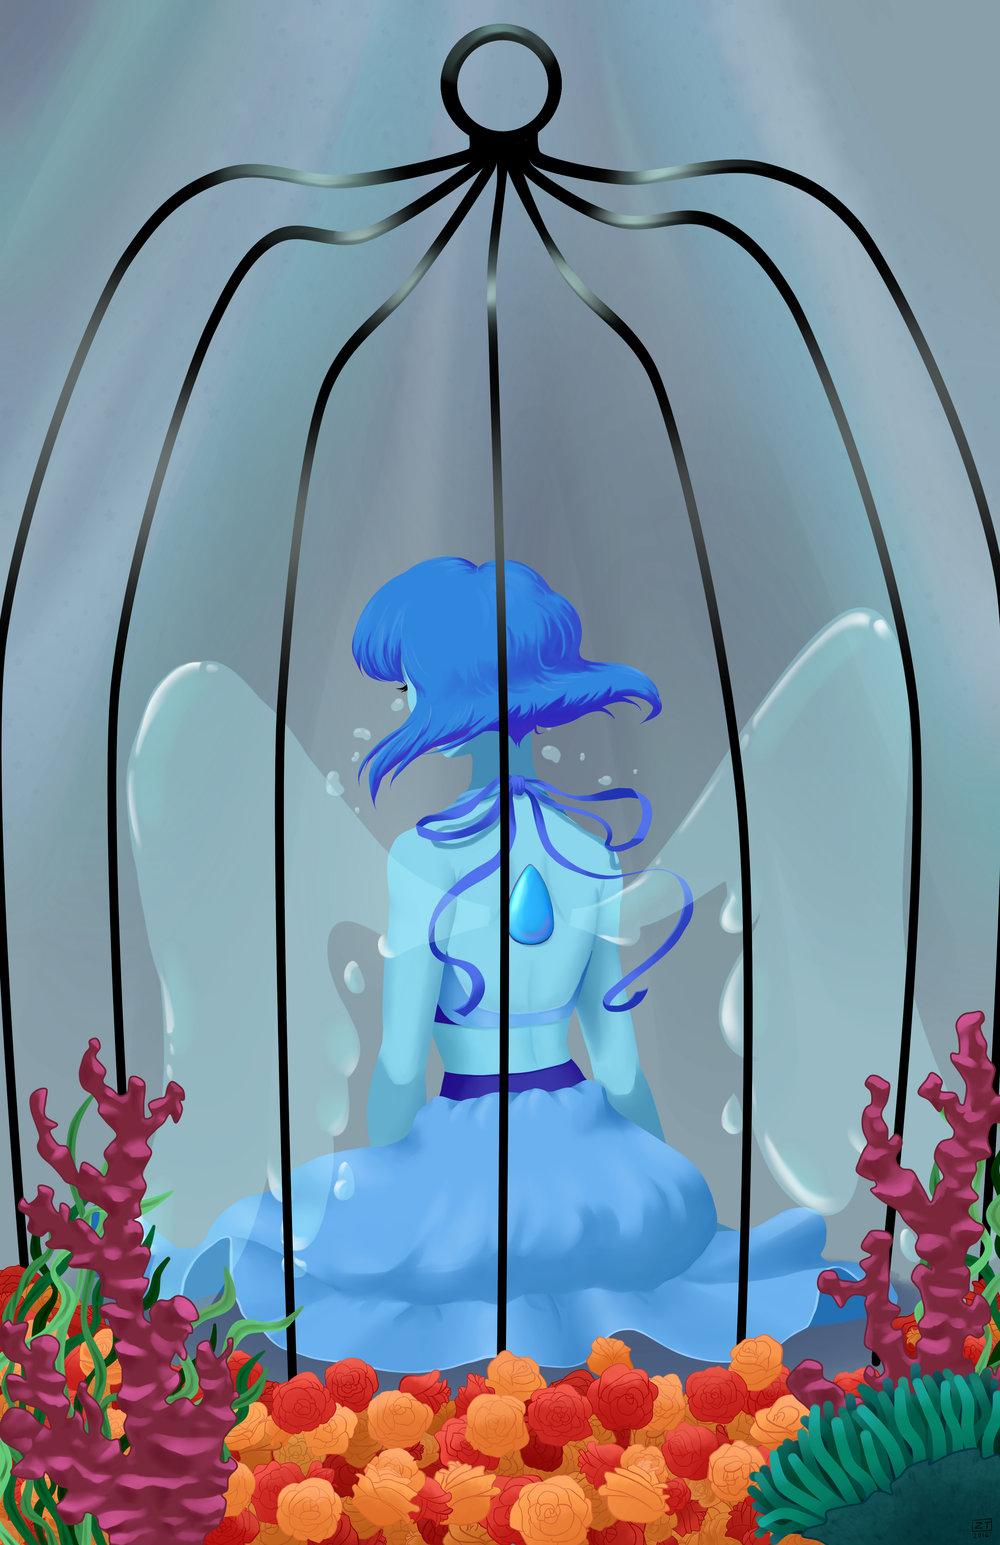 Lapis Lazuli  fanwork (Steven Universe; TV Series)   Paint Tool Sai/Photoshop, 2016